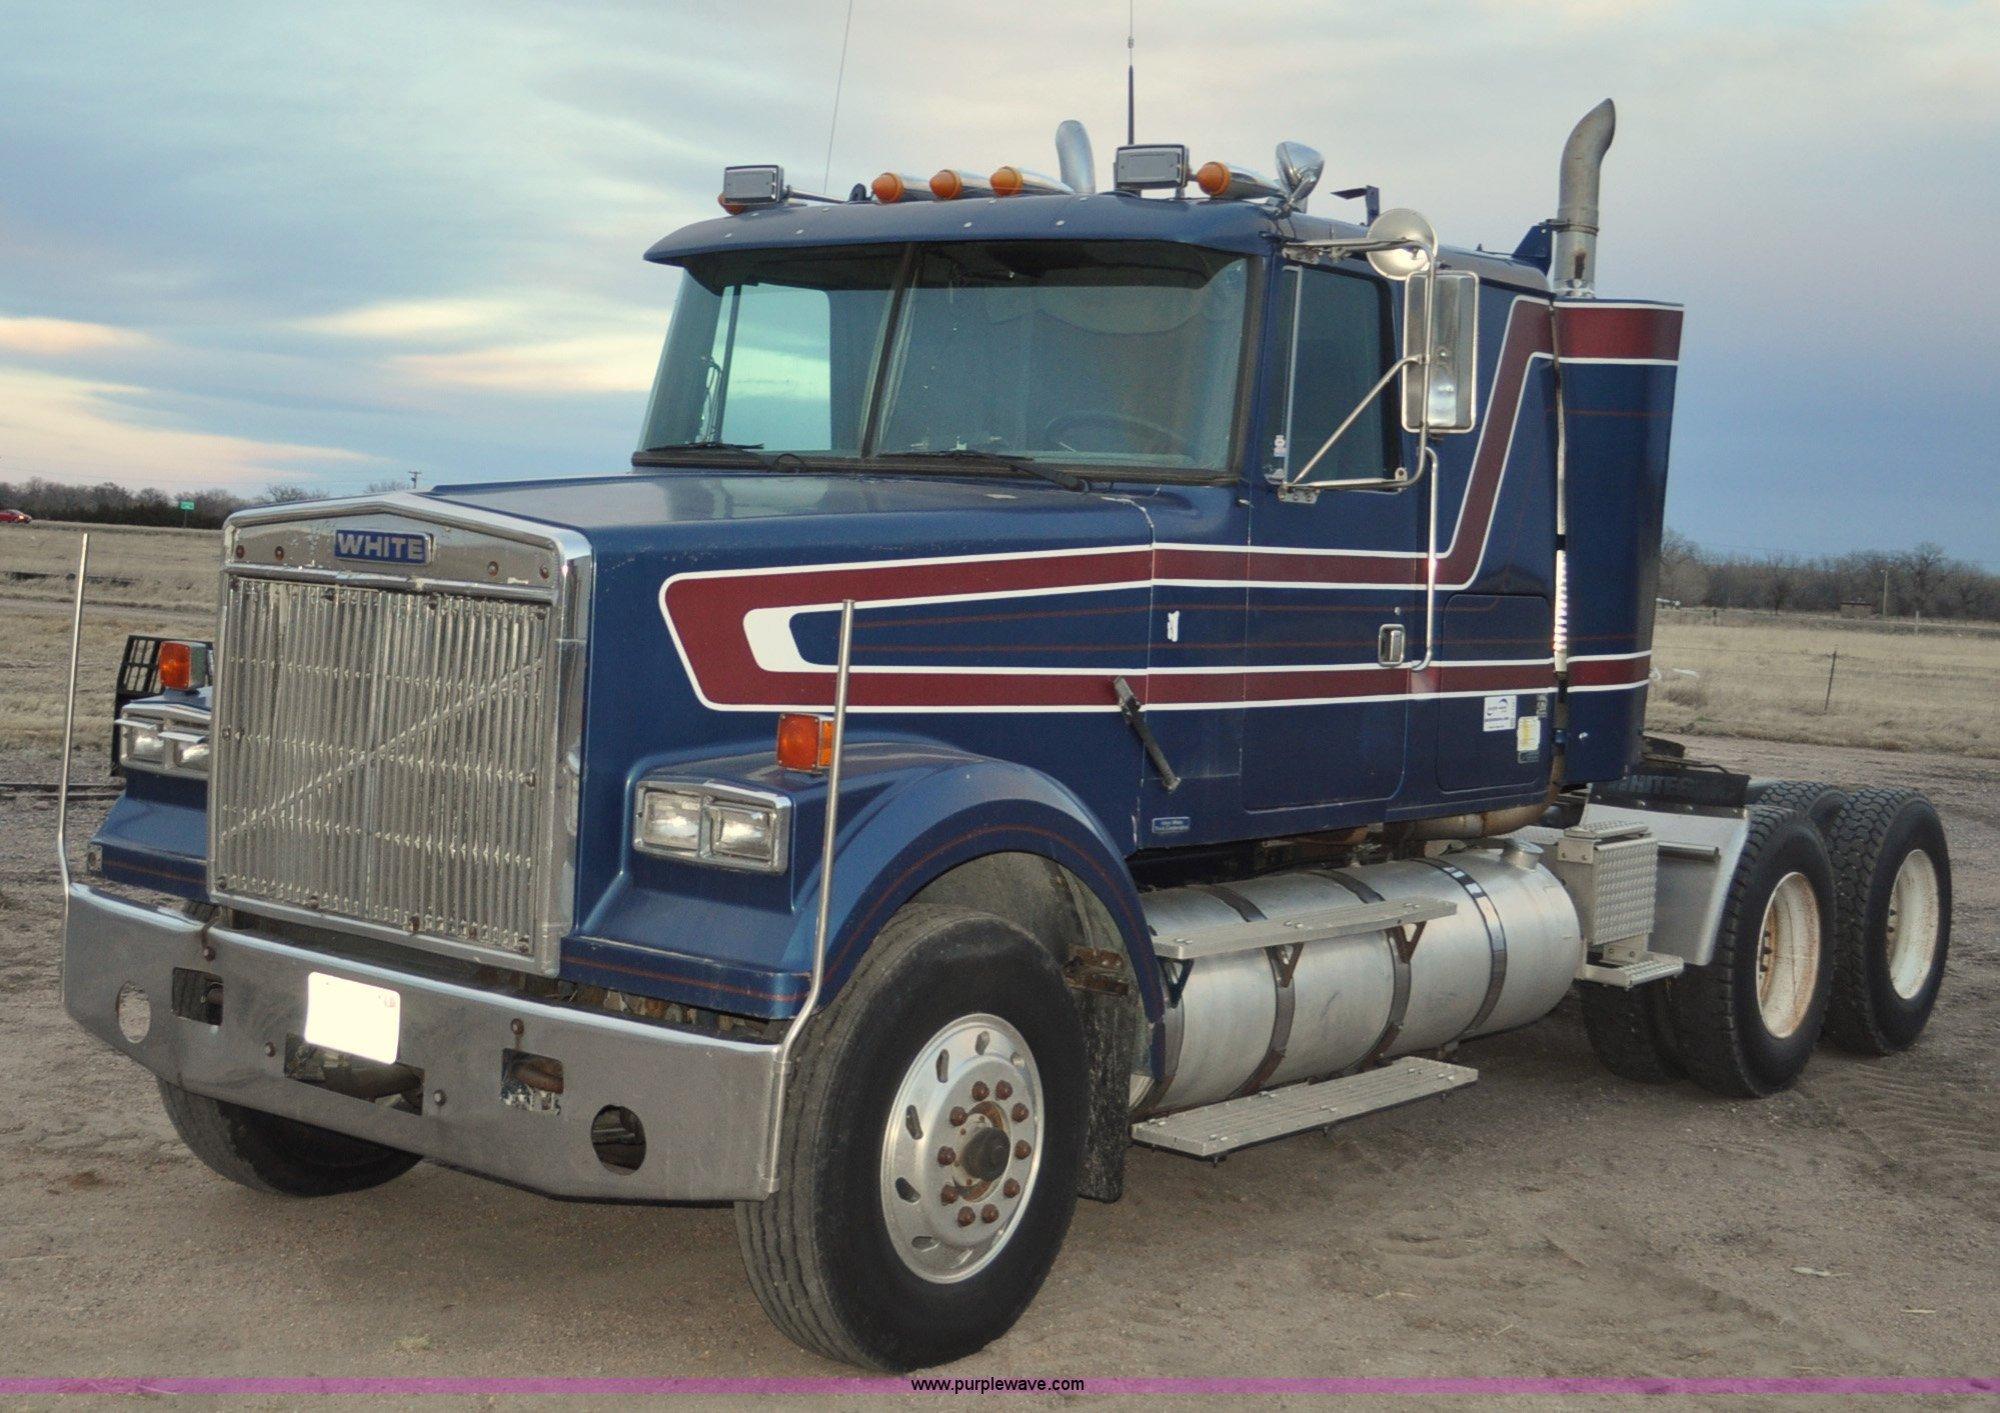 hight resolution of g7281 image for item g7281 1985 volvo white gmc semi truck